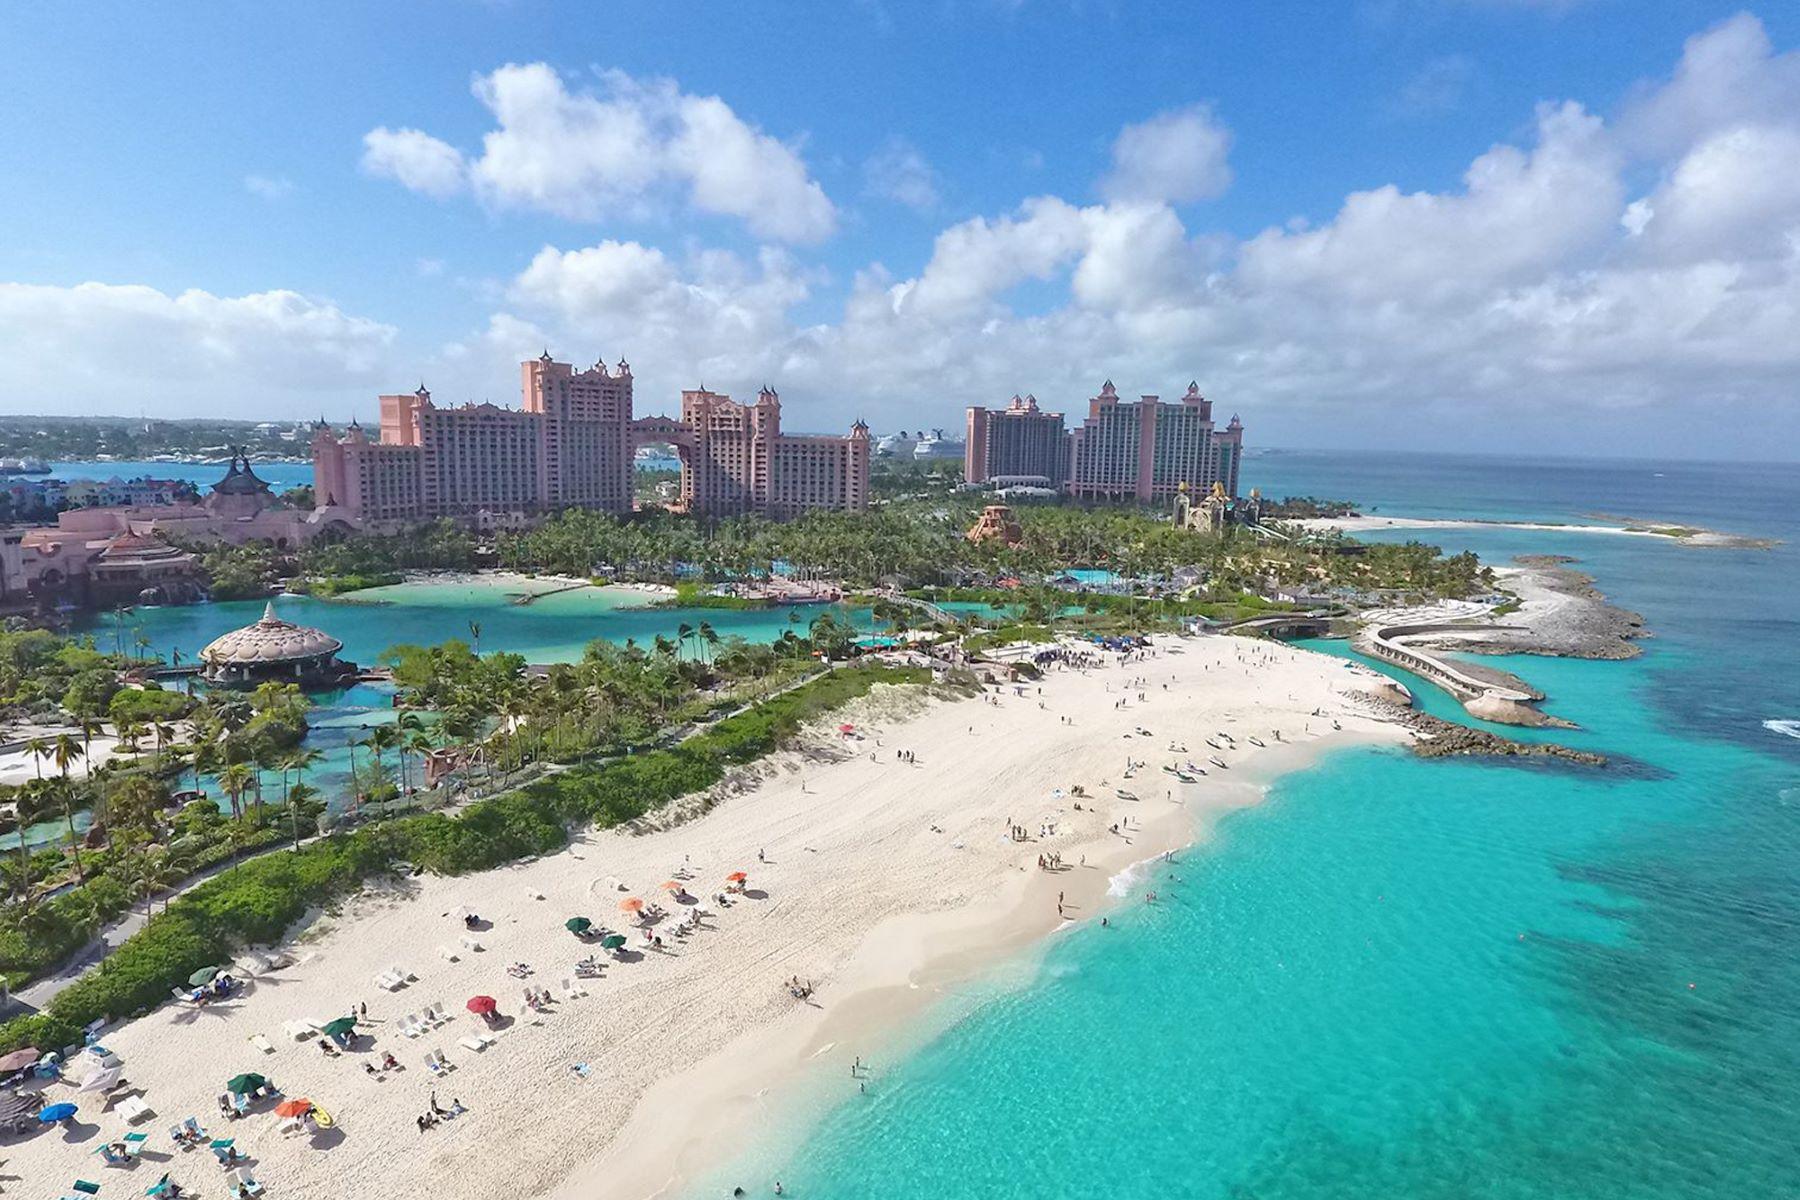 Condominium for Sale at The Reef at Atlantis 21-923 The Reef At Atlantis, Paradise Island, Nassau And Paradise Island Bahamas